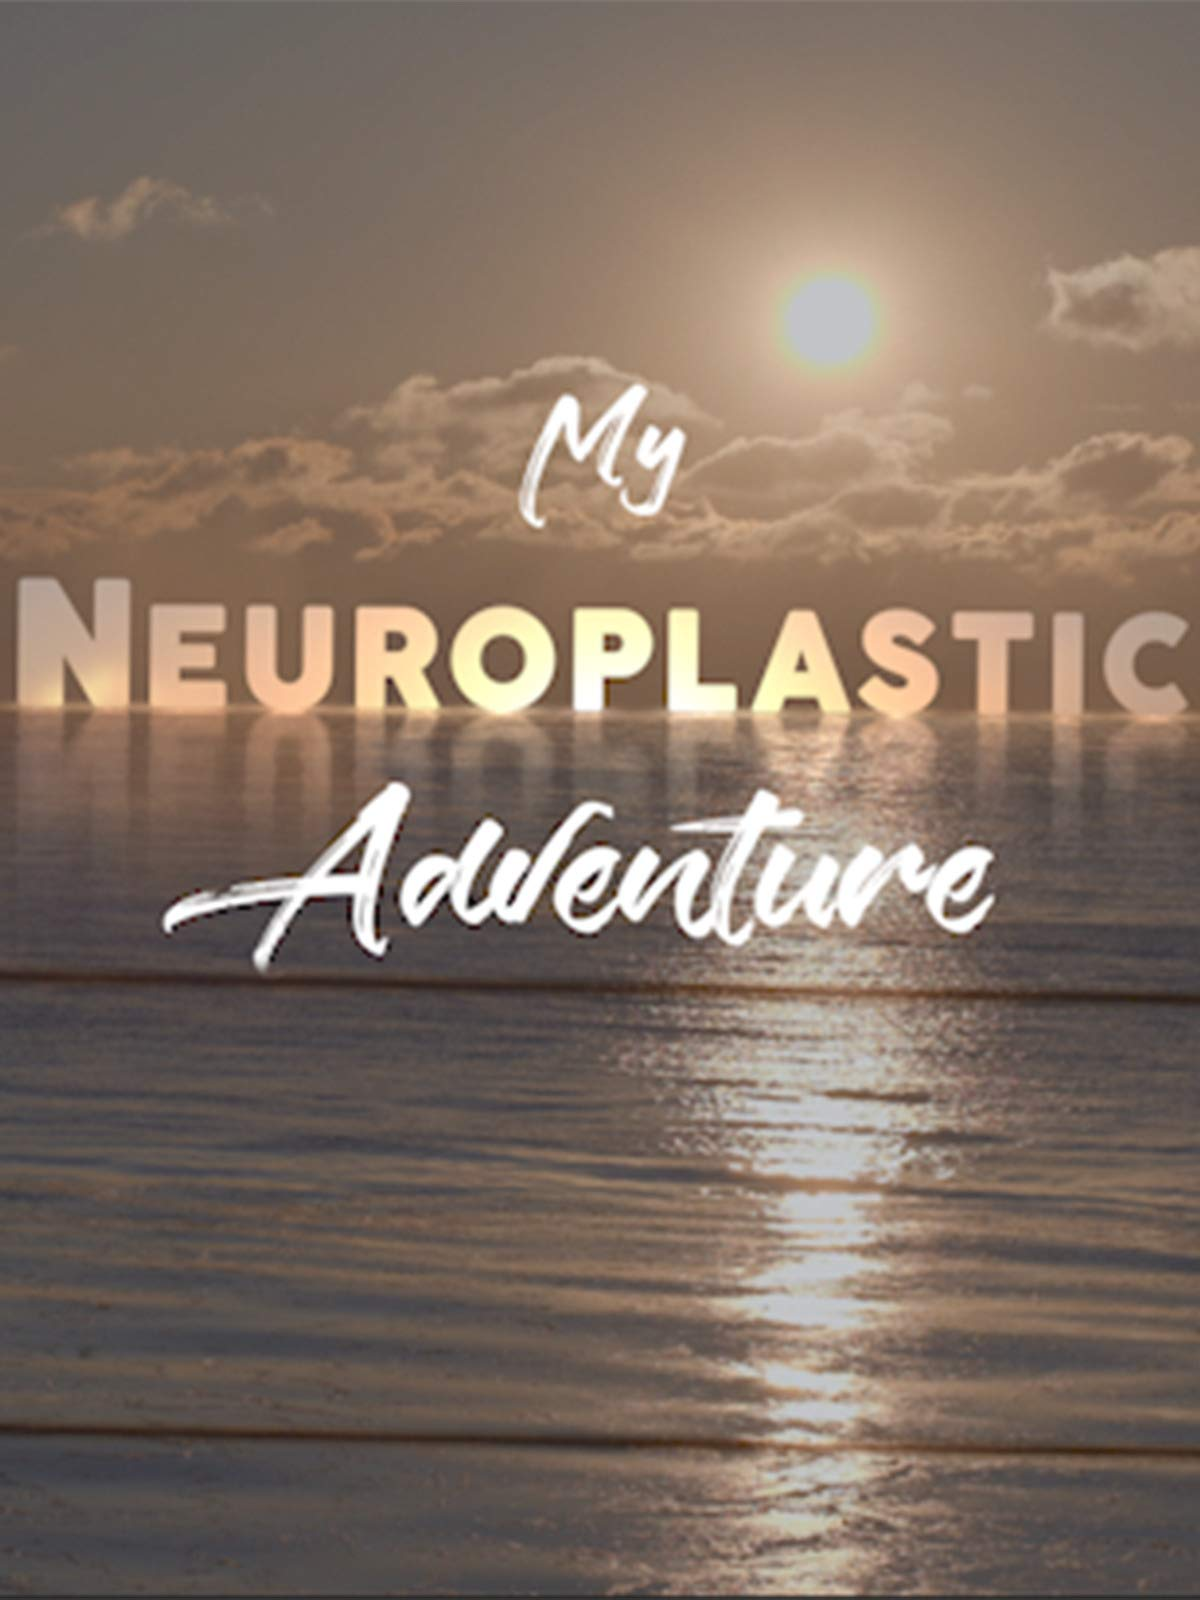 My Neuroplastic Adventure